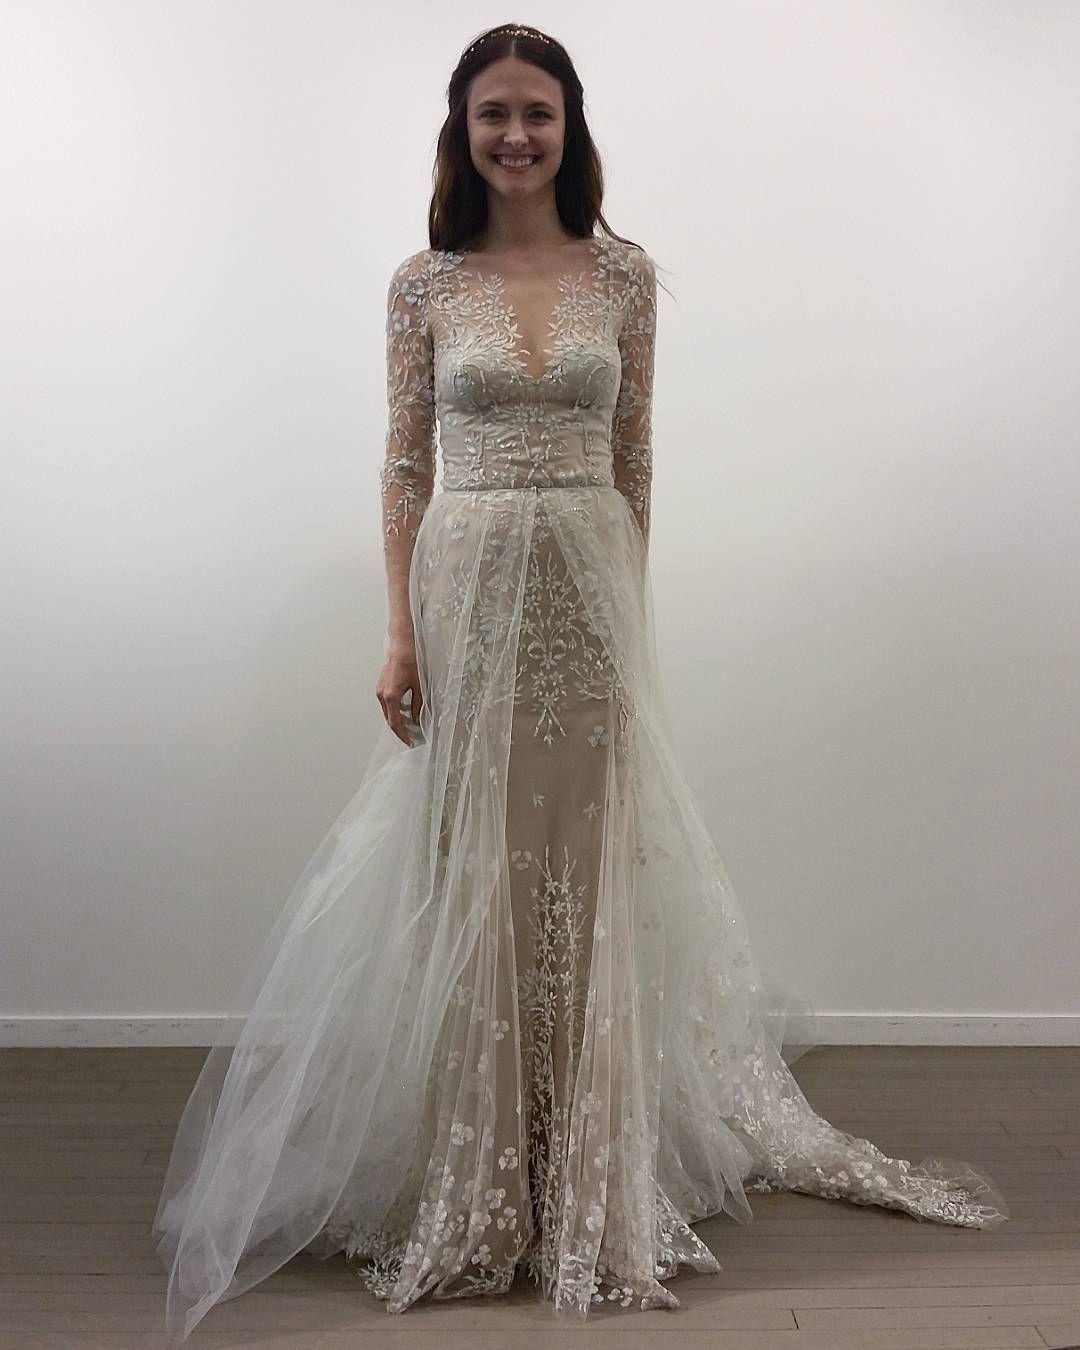 Trendy New York Bridal Fashion Week Show fall new collection wedding dress designer bridal gown catwalk